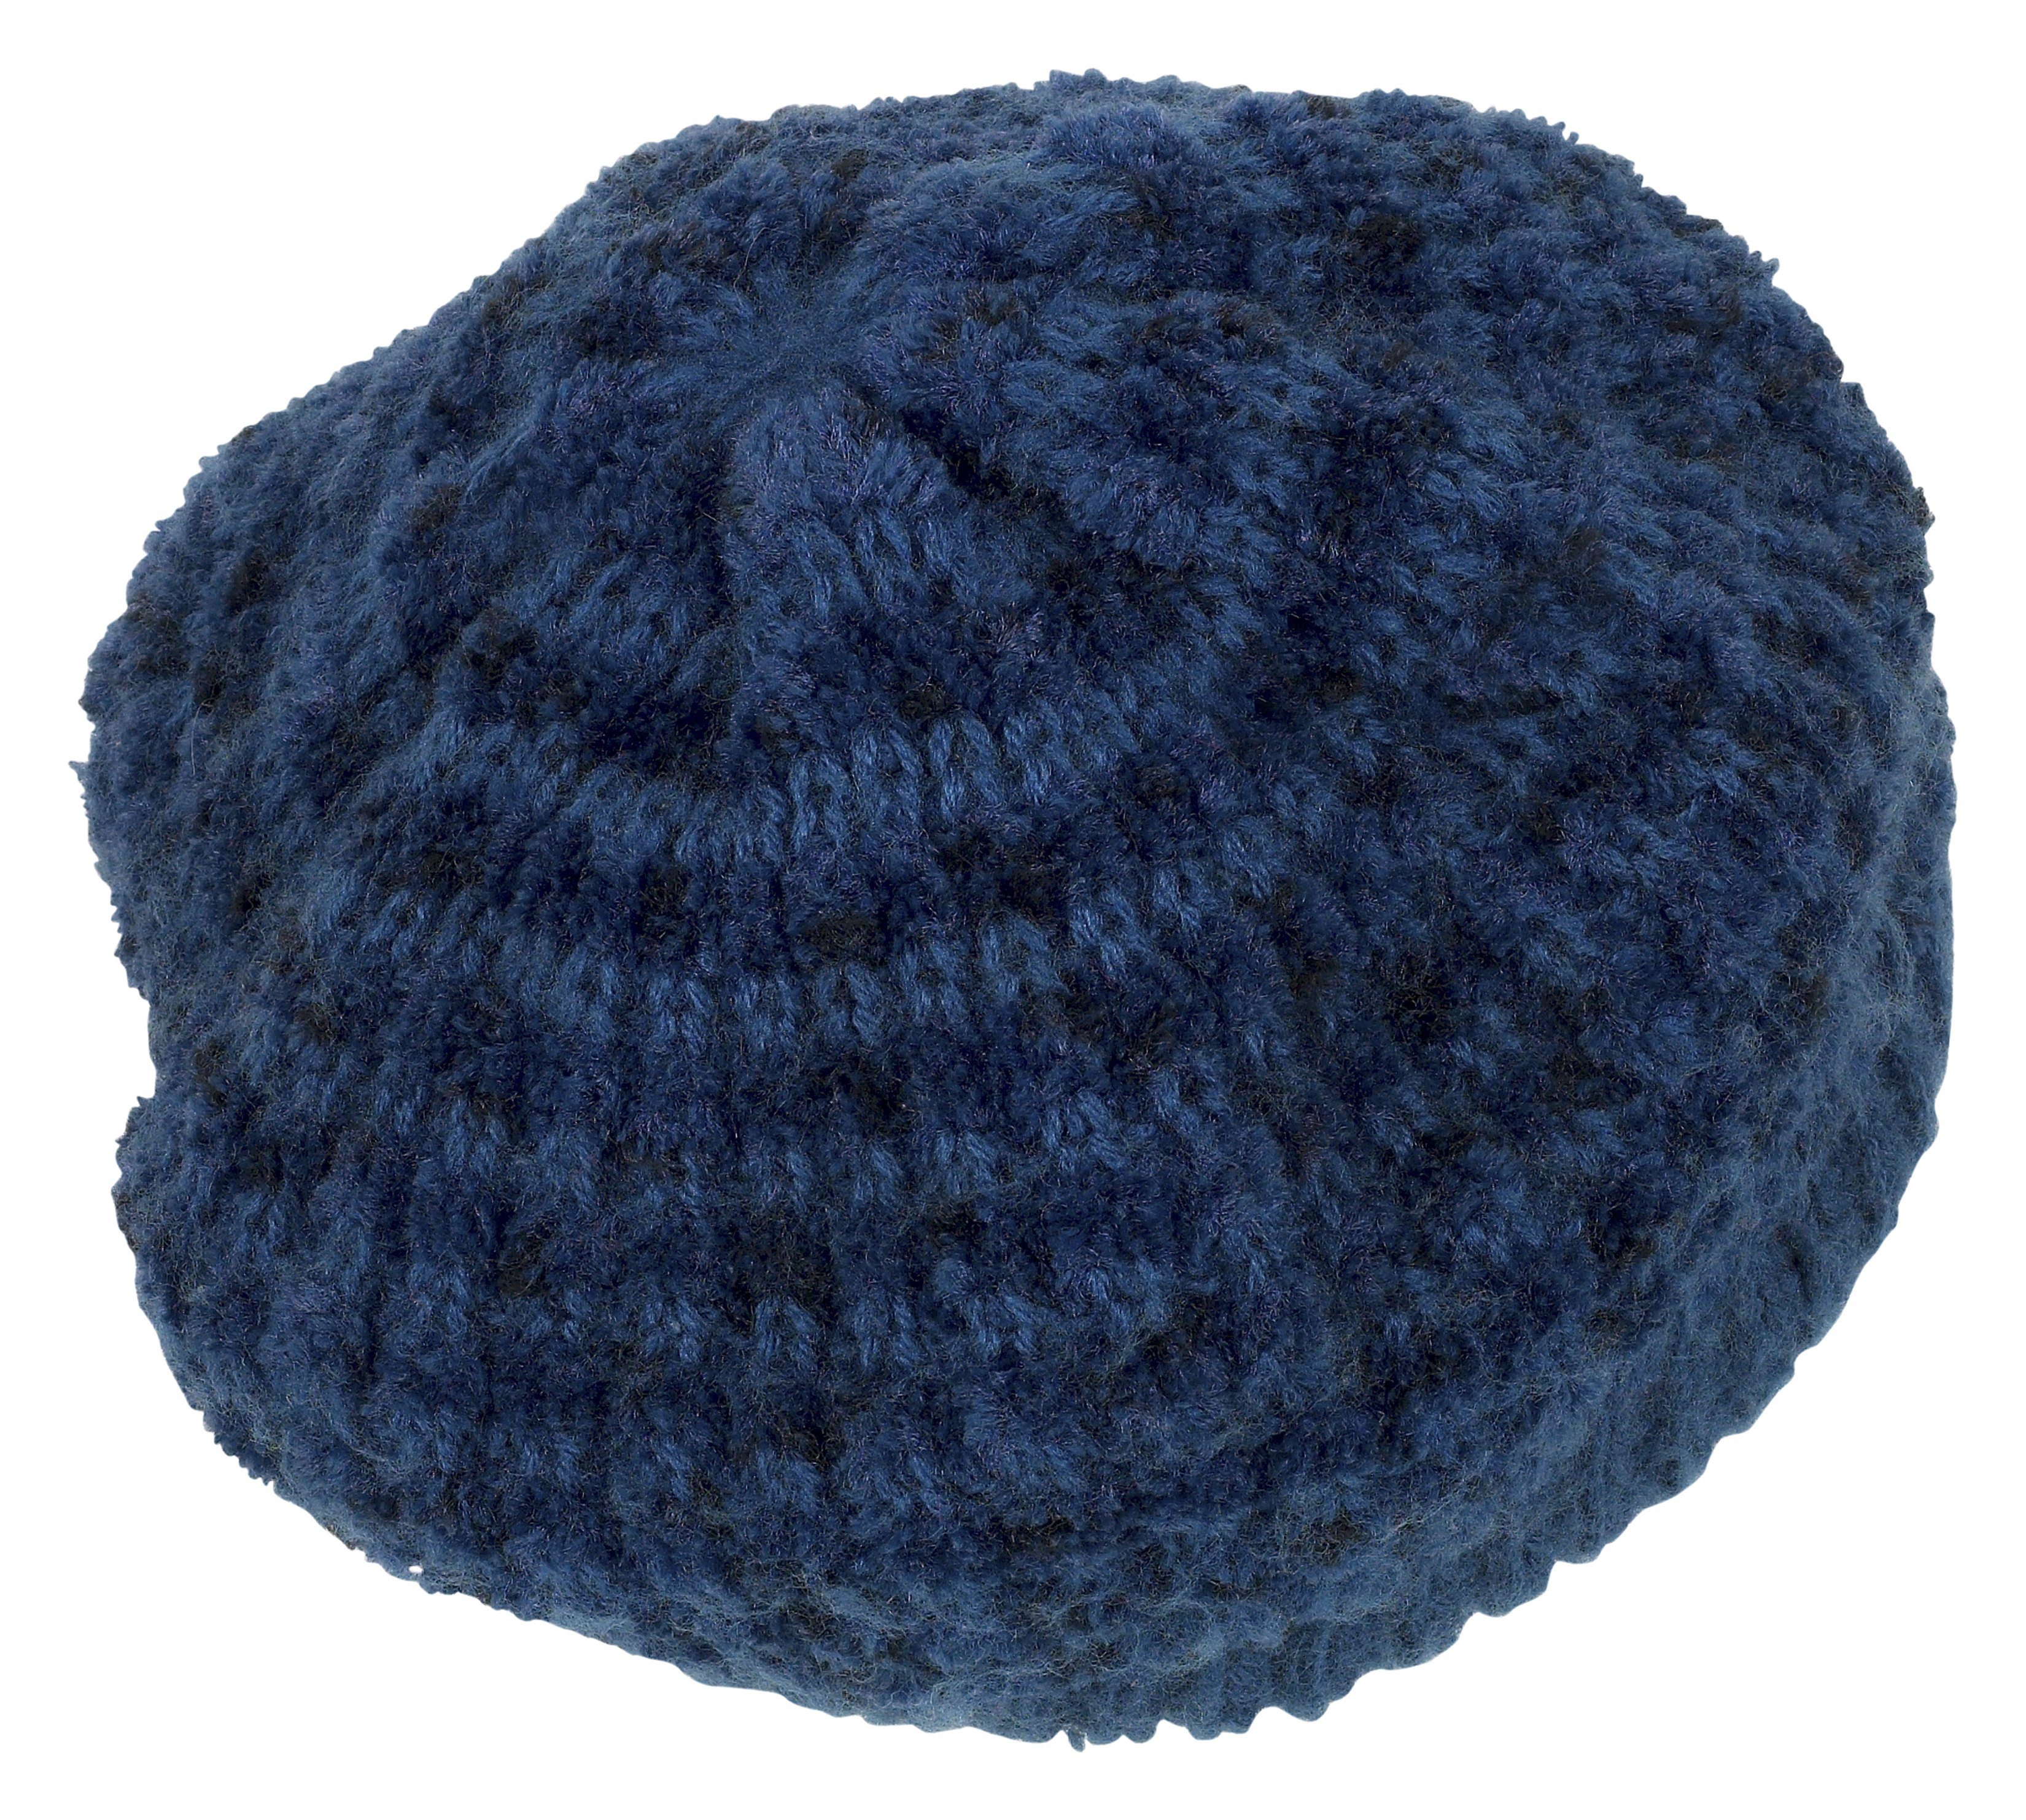 Knitting Joining Yarn On Circular Needles : How to make an easy knit beret on circular needles ehow